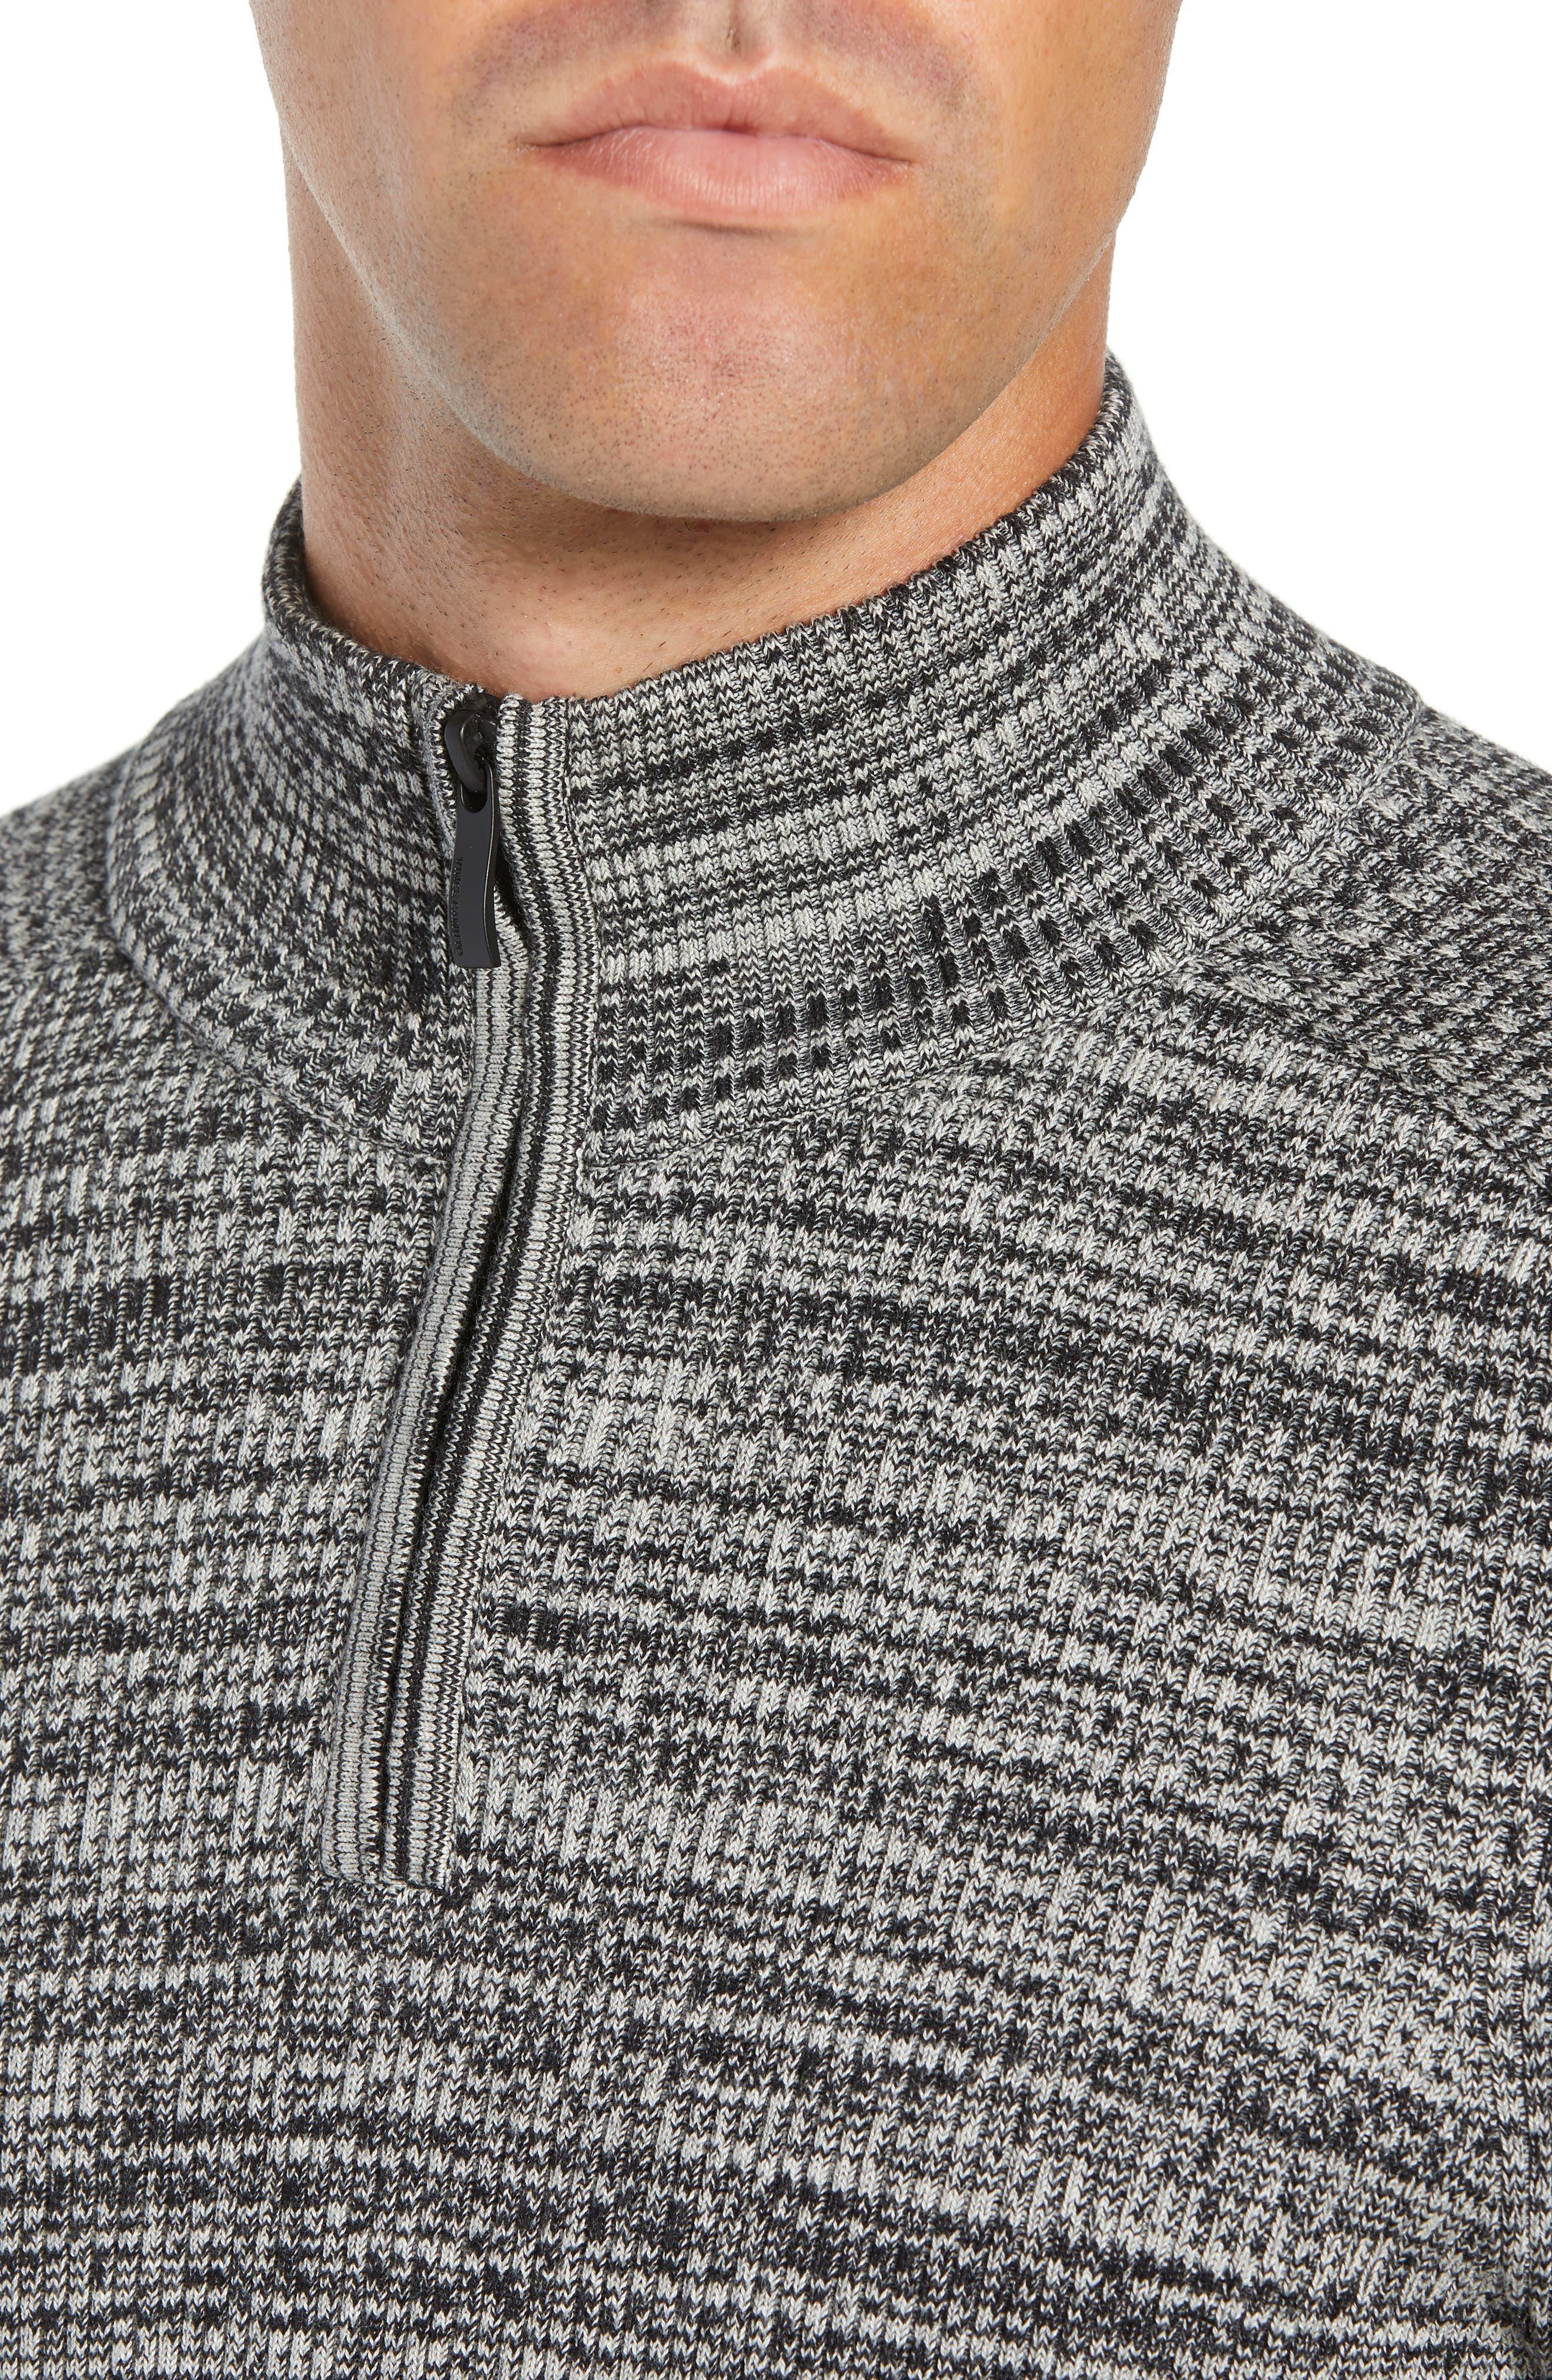 Vince Caumto Quarter Zip Mock Neck Sweater,                             Alternate thumbnail 4, color,                             GREY